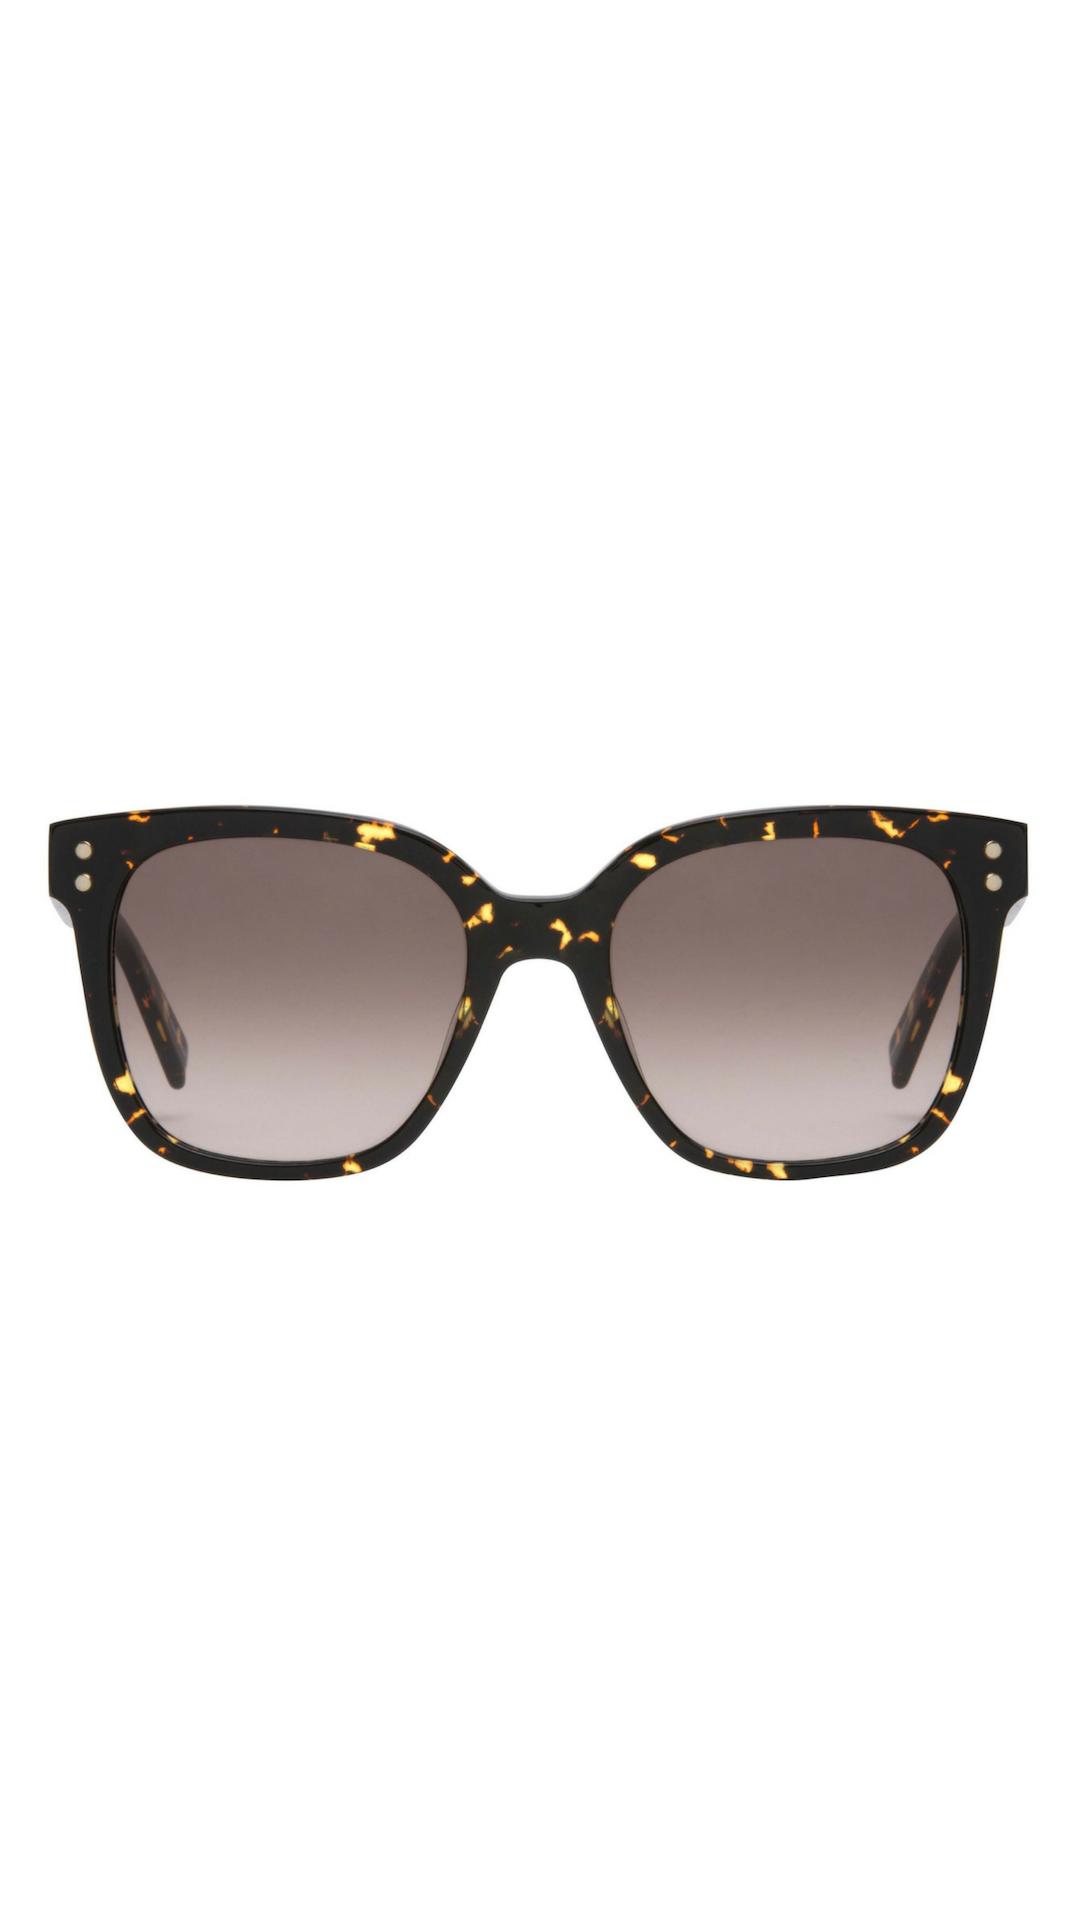 e84f6b23058 Cyndi Acetate Square Sunglasses